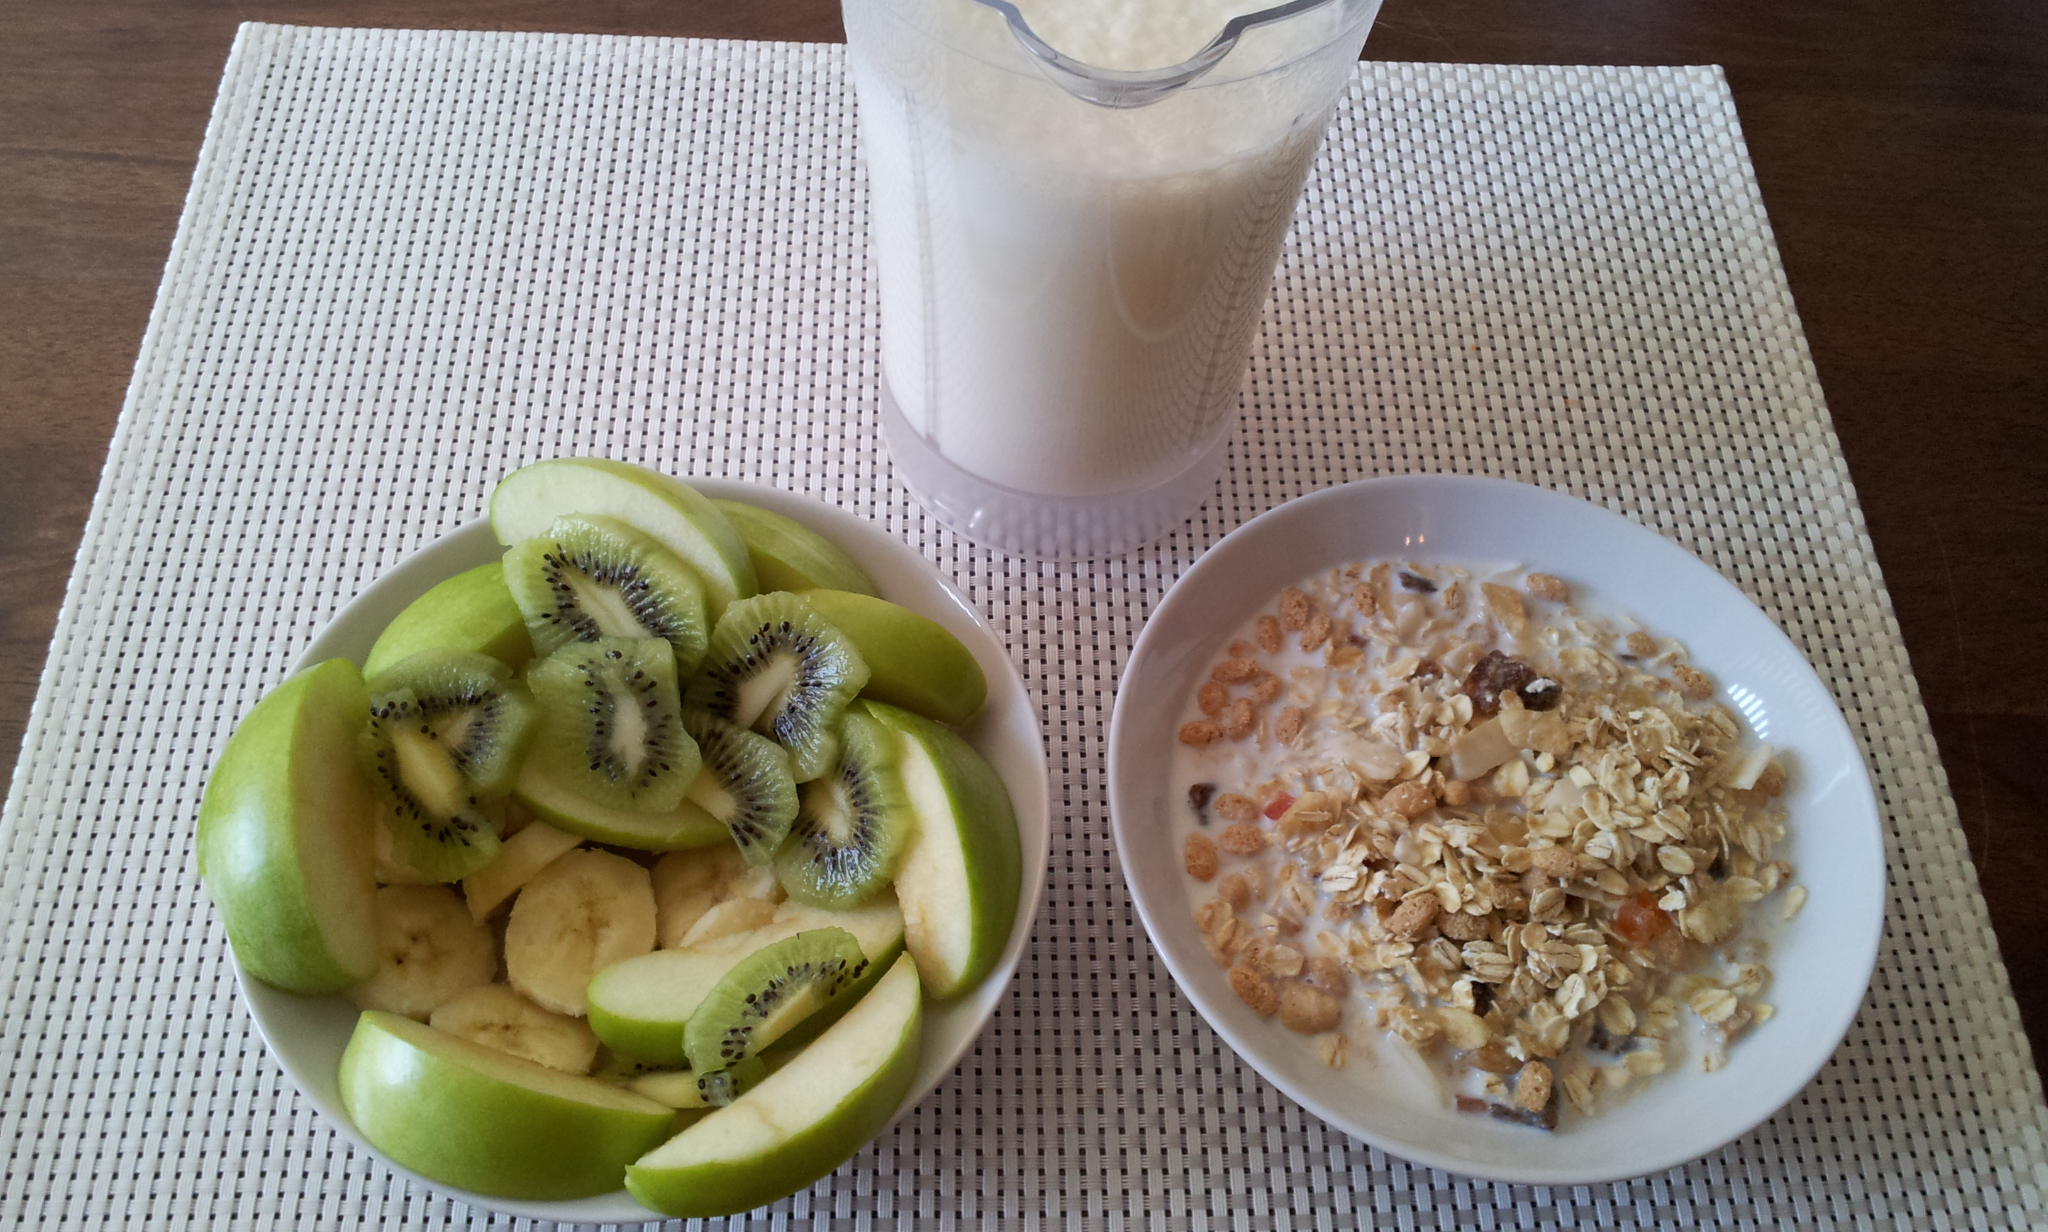 http://foodloader.net/Holz_2013-07-22_Bananenshake_mit_Muesli_und_Obstsalat.jpg